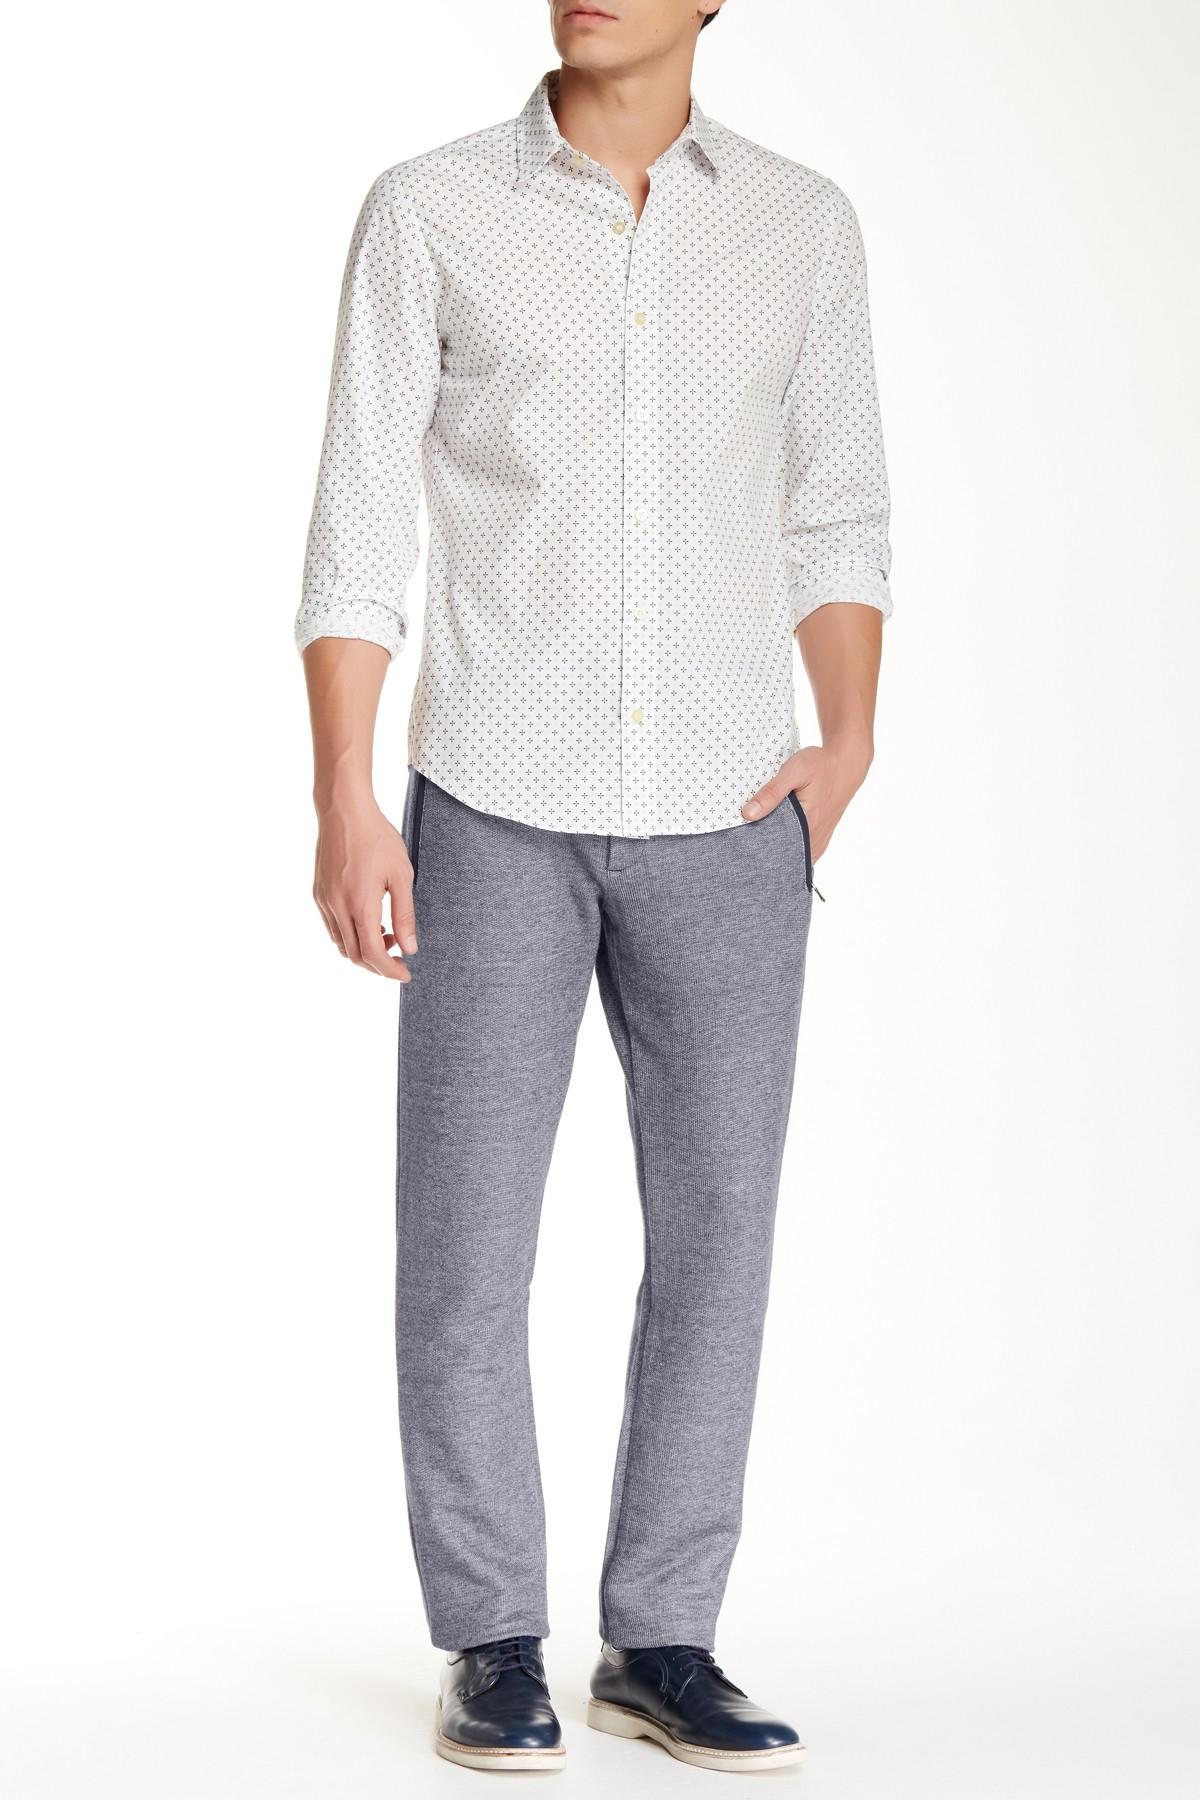 lyst parke ronen mont blanc trouser in blue for men. Black Bedroom Furniture Sets. Home Design Ideas